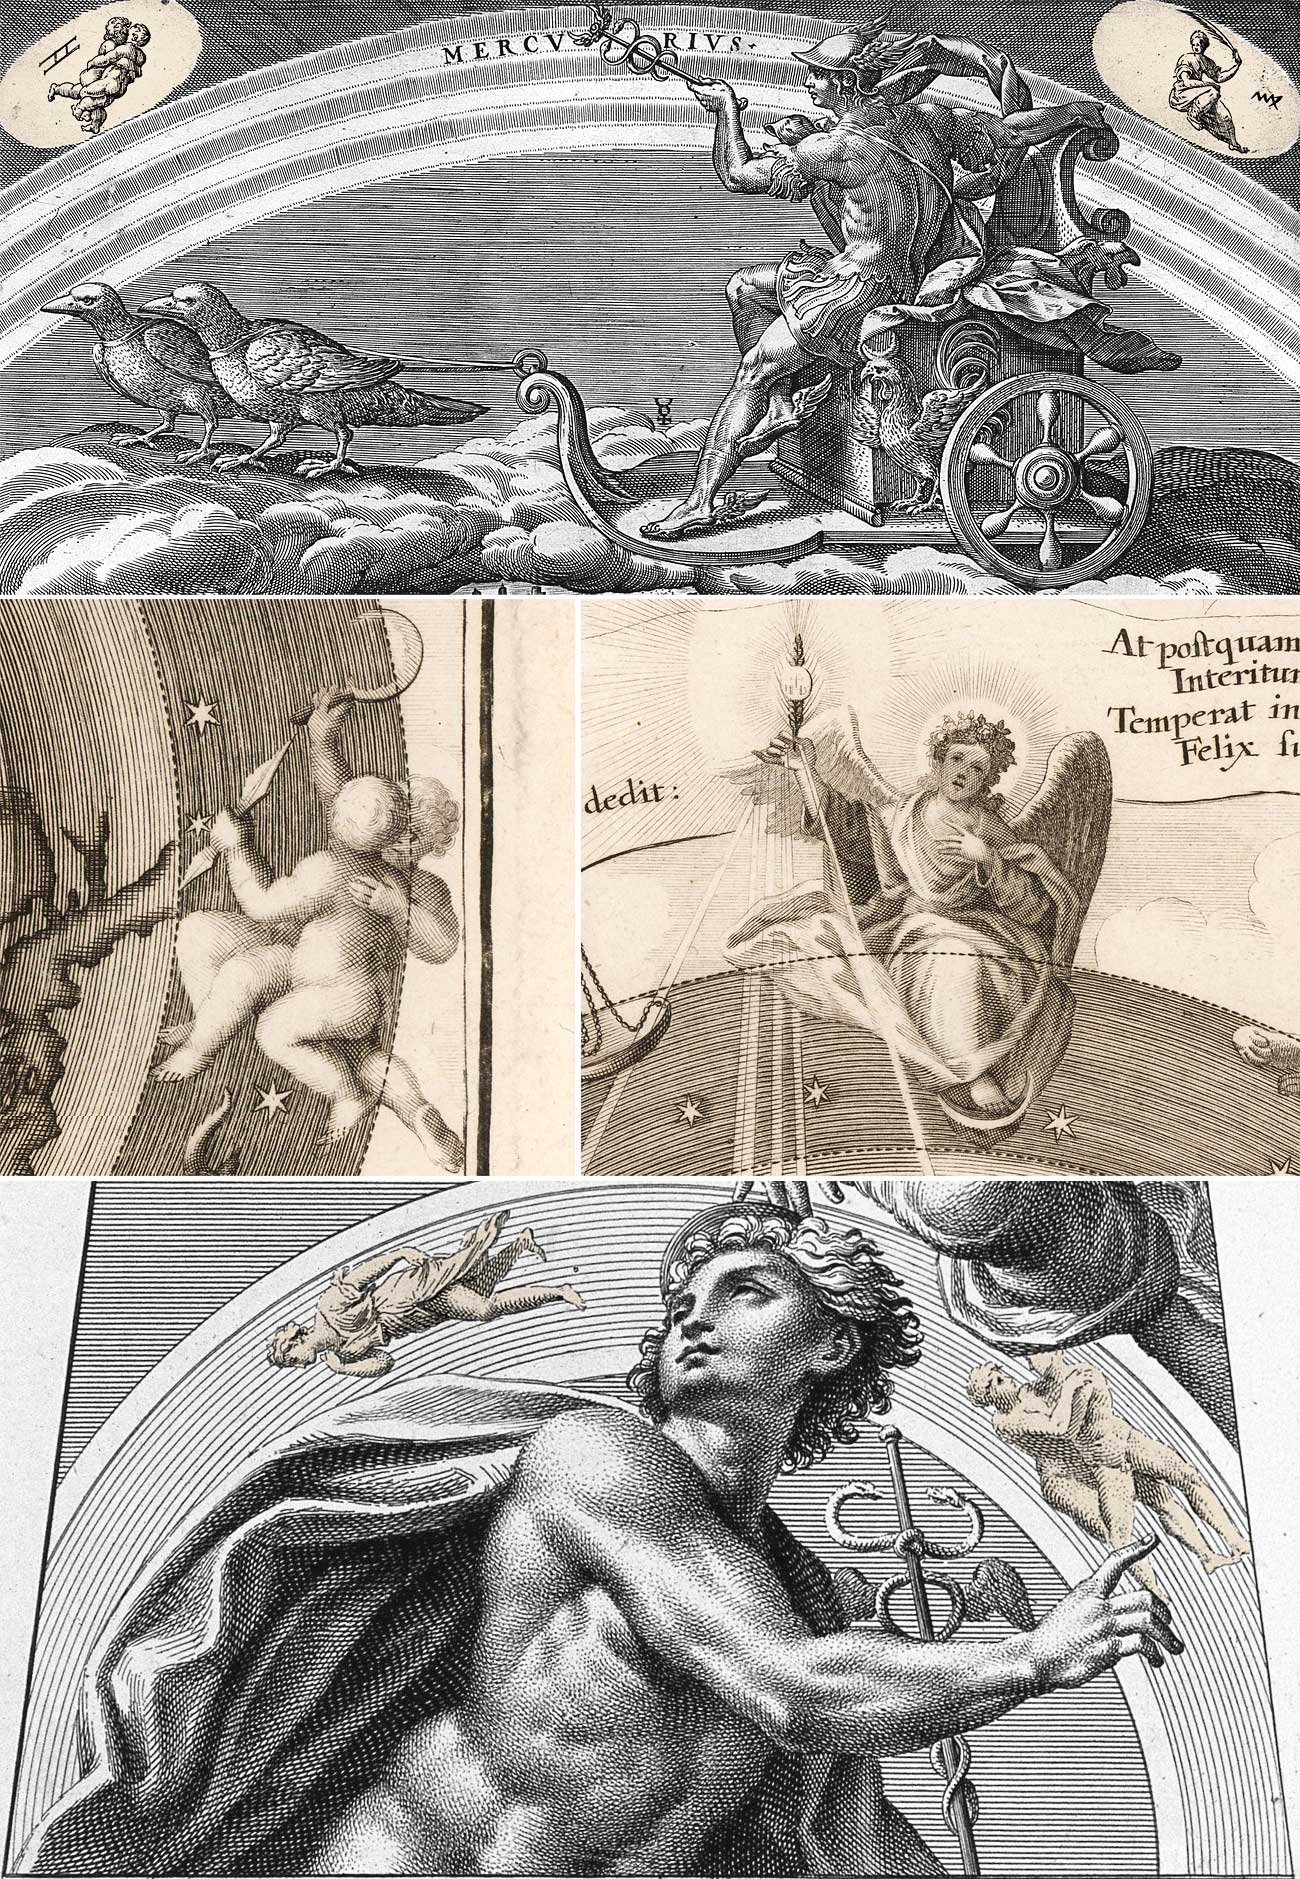 Меркурий: Дева и Близнецы (знаки зодиака) к банкнотам. Mercury: Virgo and Gemeni